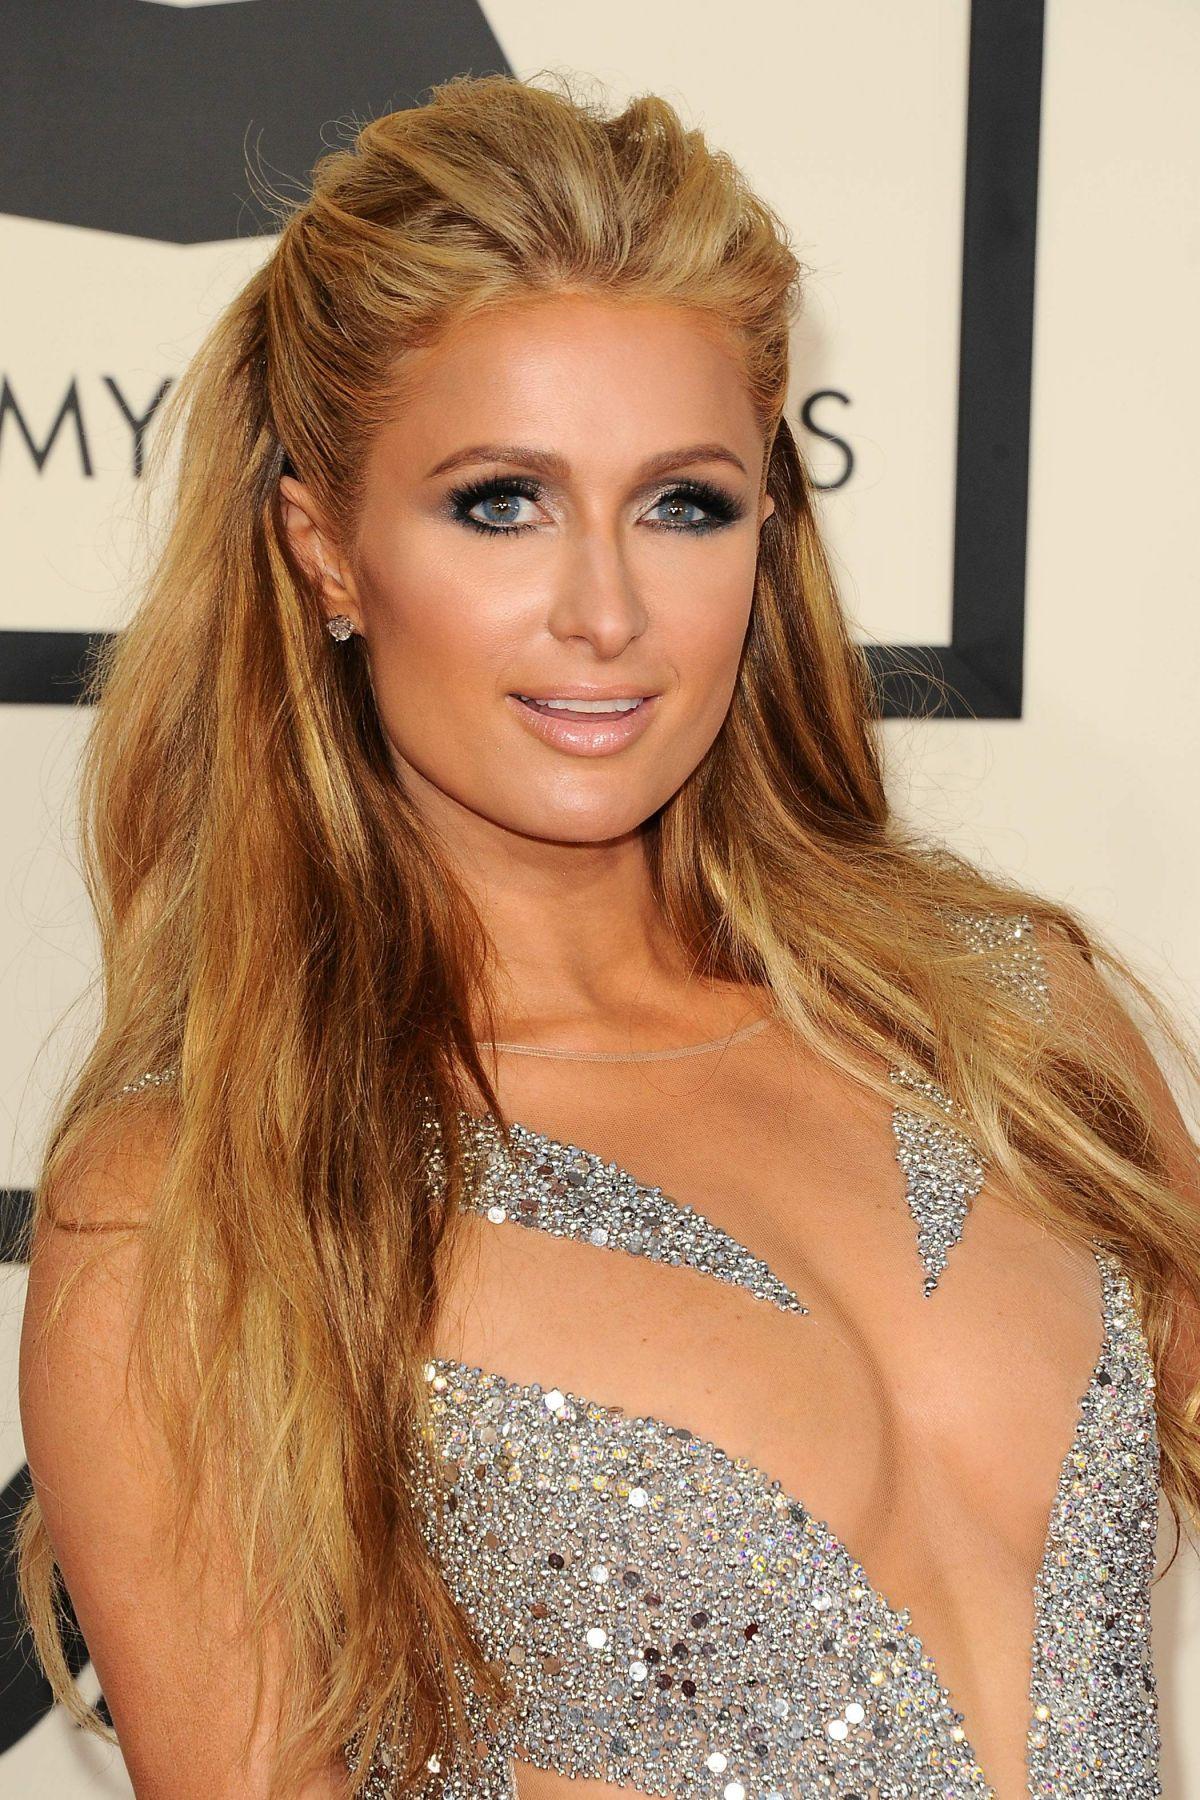 Watch Disturbing Prank Convinced Paris Hilton She Was Going to Die in a Plane Crash video